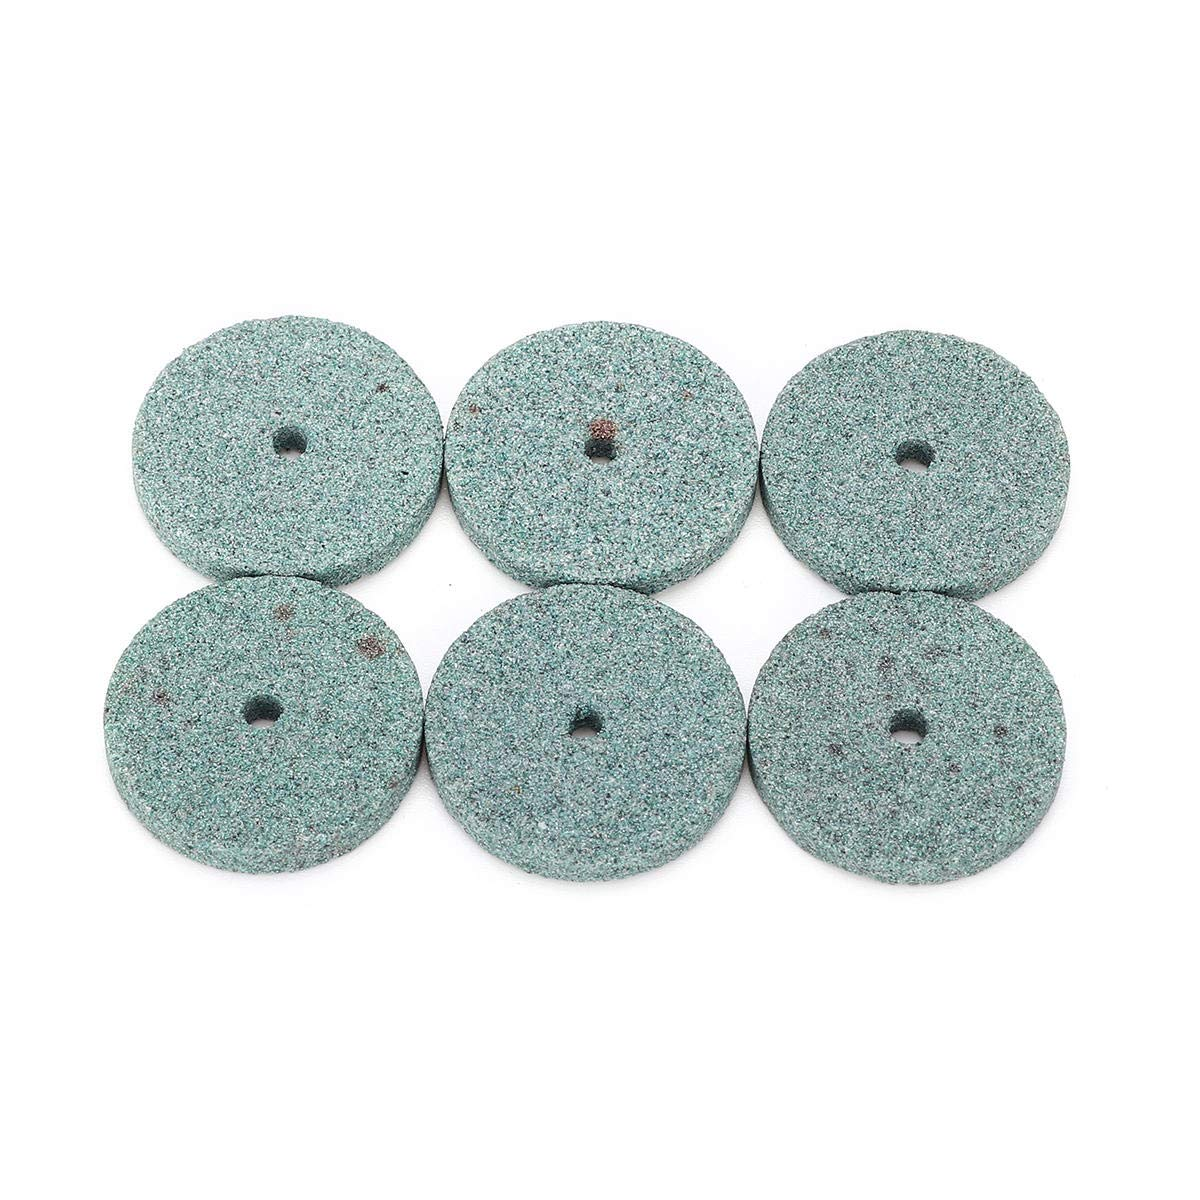 Hvlystory 161Pcs Mini Grinding Polishing Sanding Accessories Set for Electric Grinder Abrasive Tool